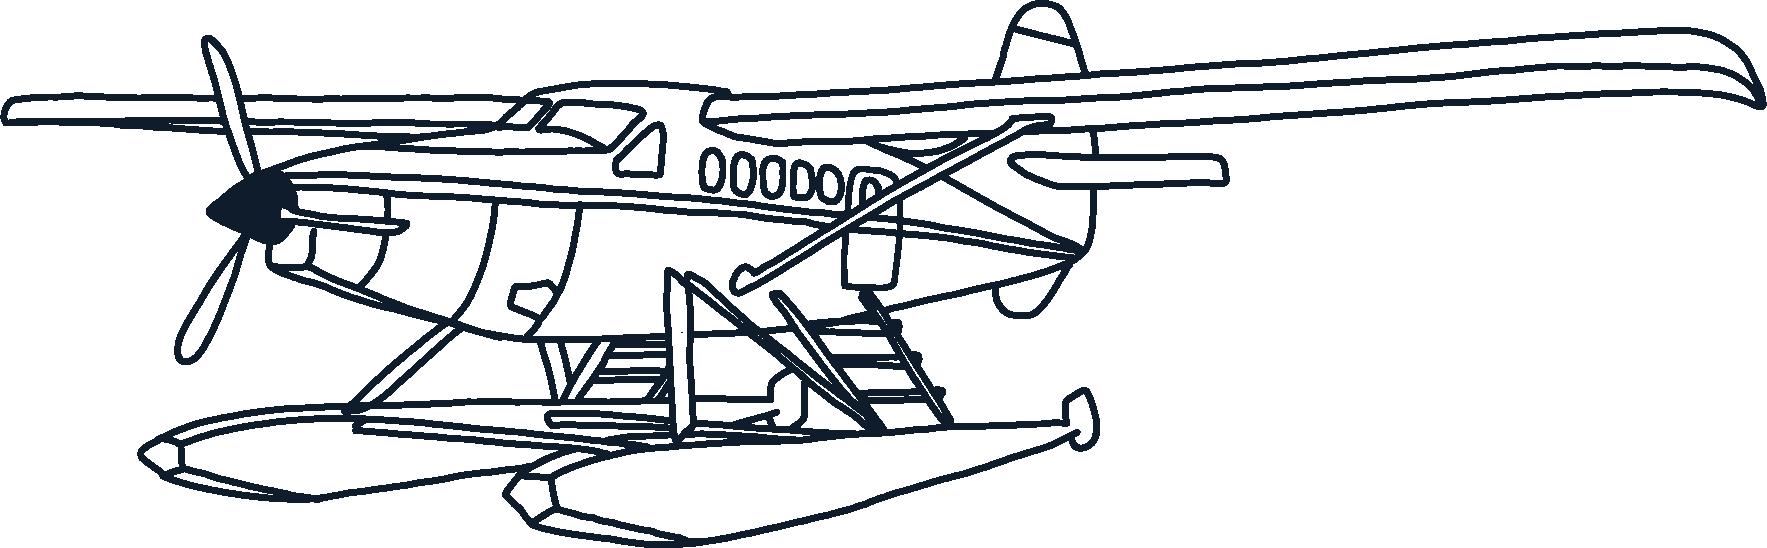 EAS-Plane@4x.png